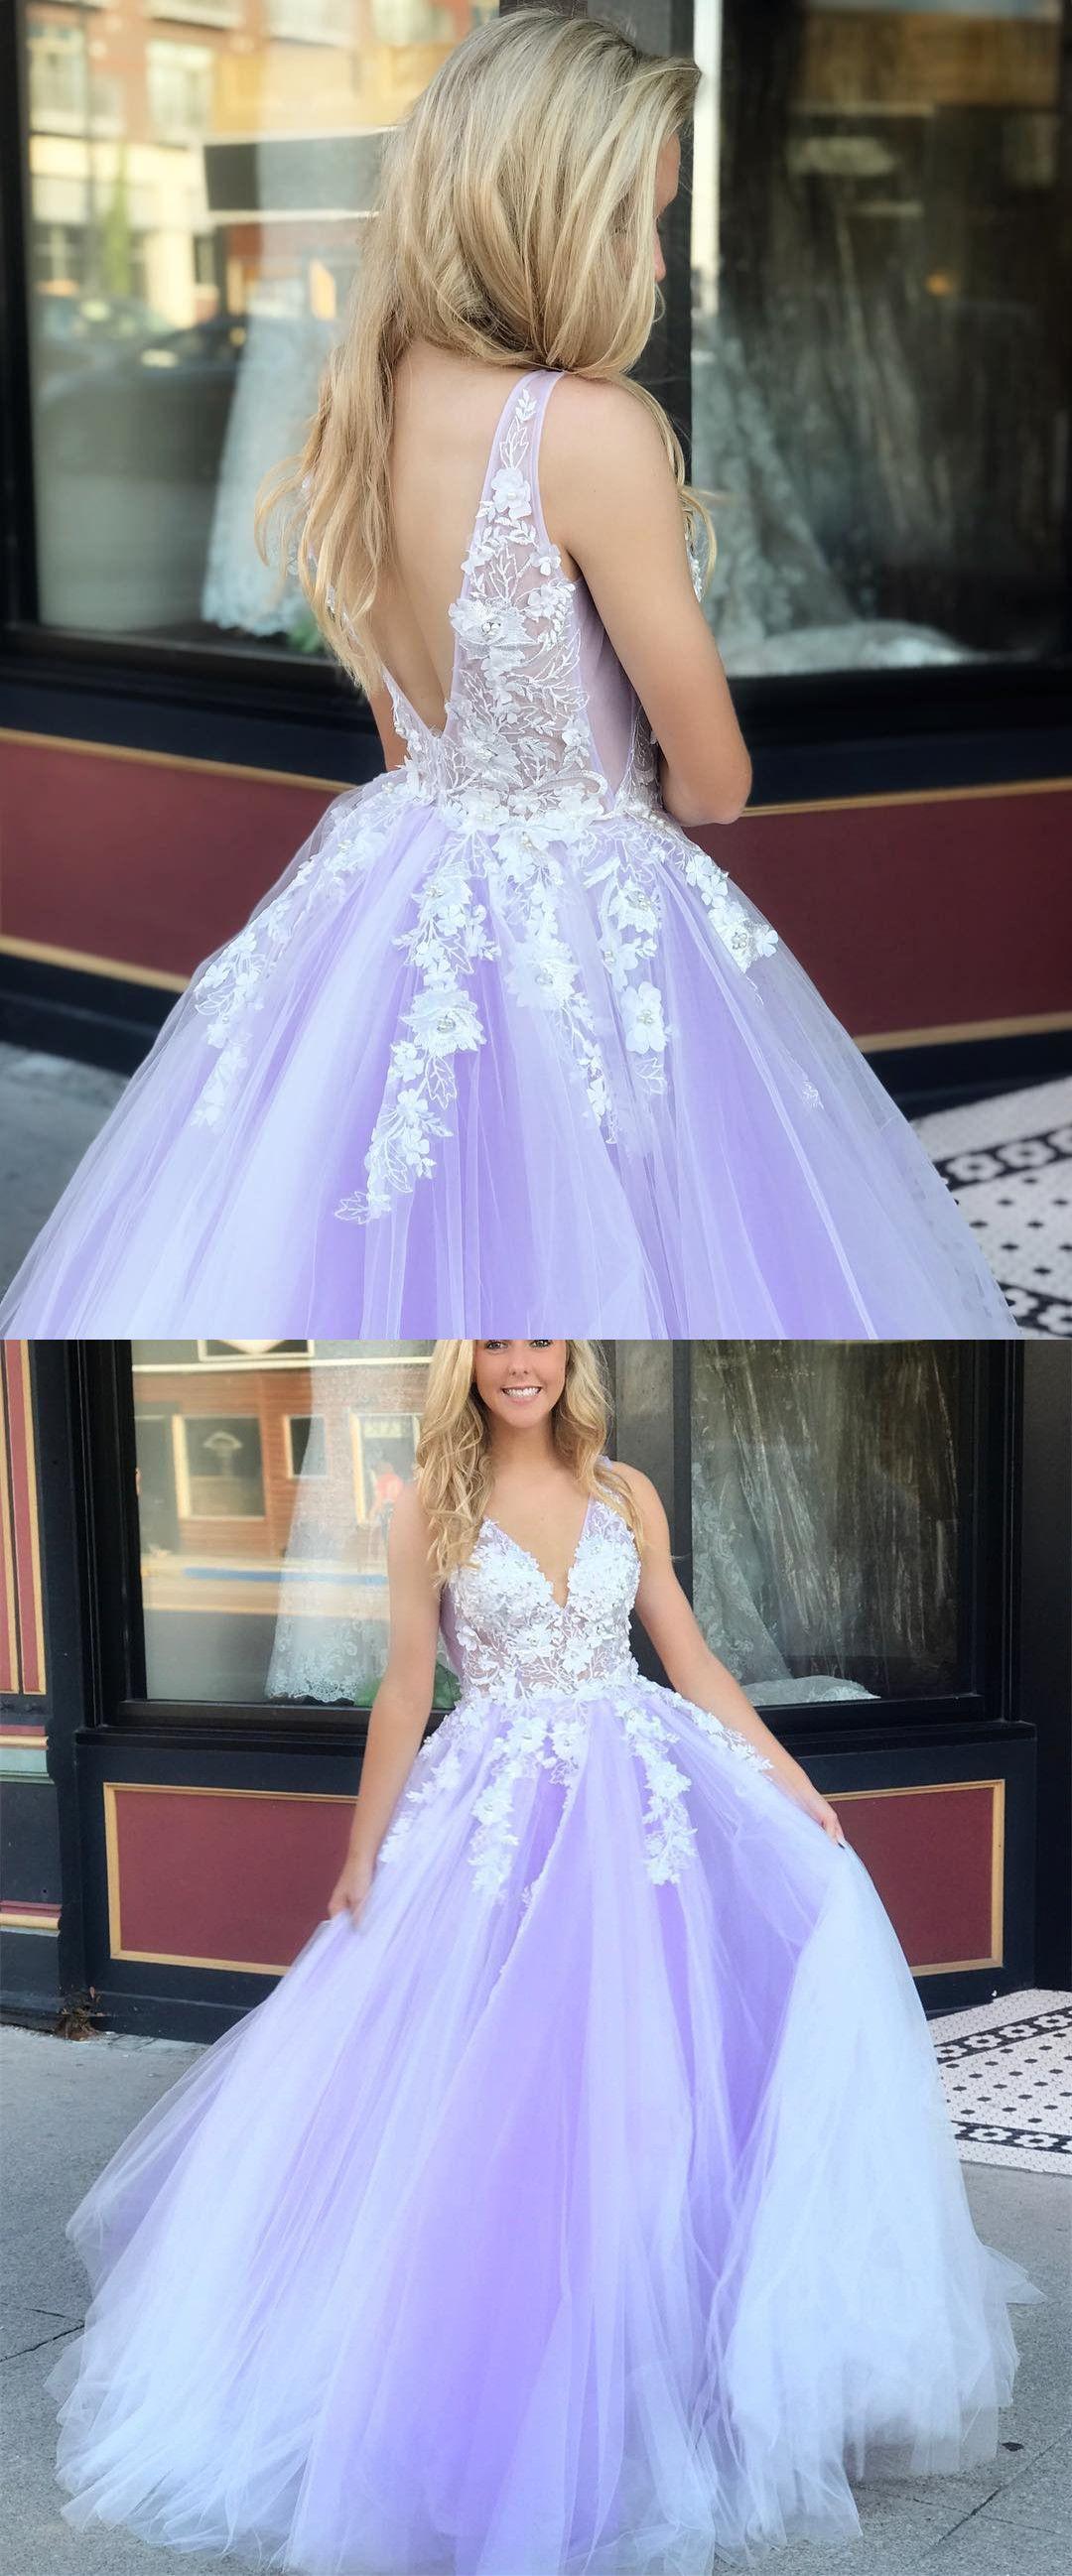 6e94c64e9911 princess lavender tulle long prom dress with white lace, 2019 prom dress,  elegant formal evening dress